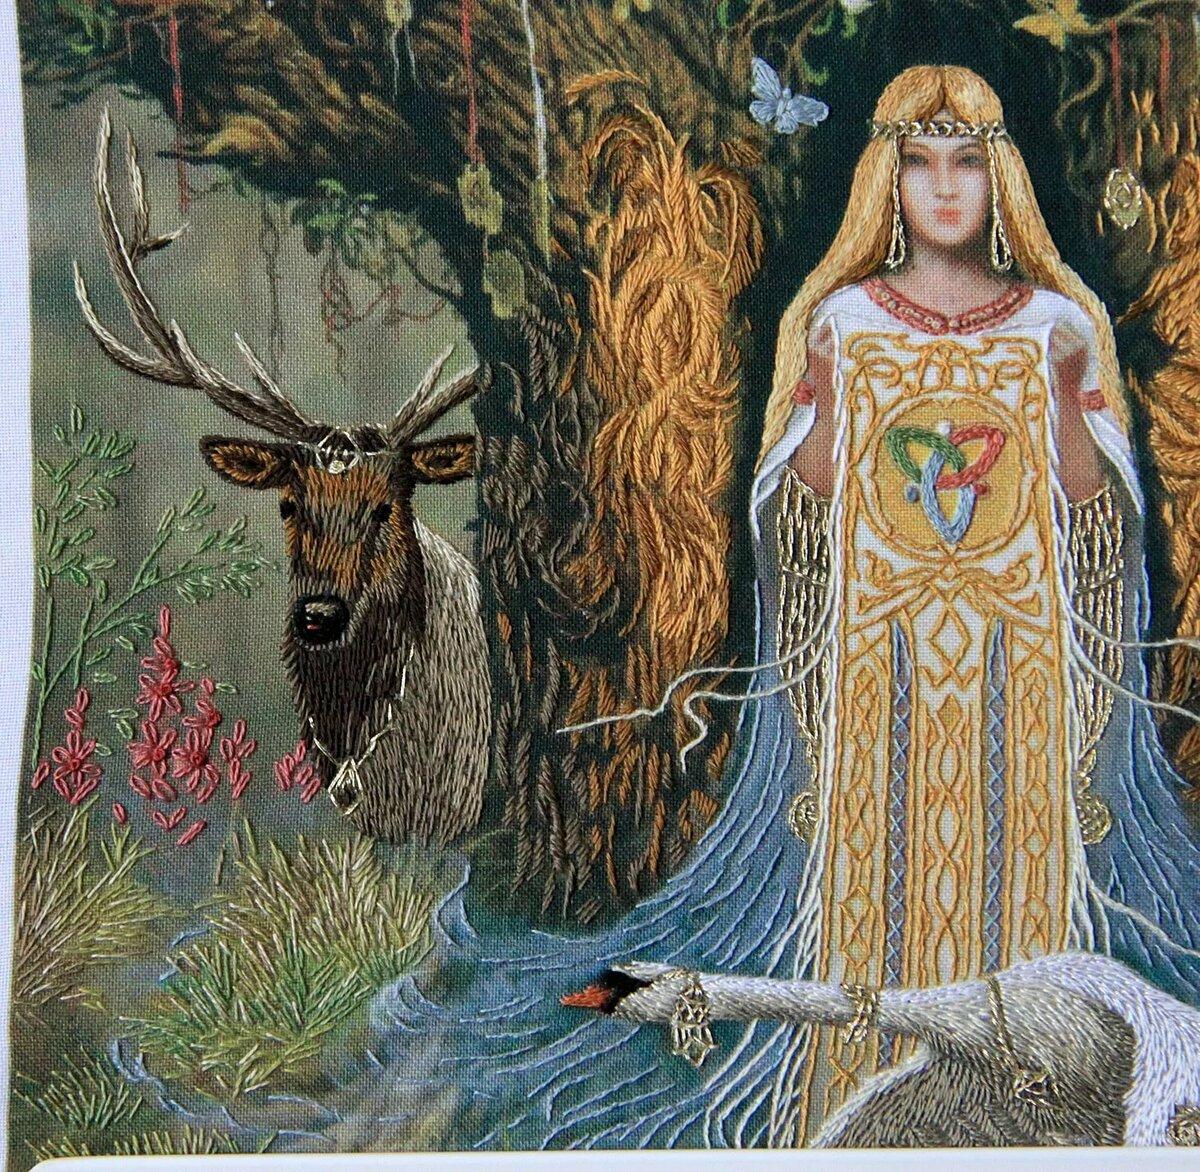 советским жива богиня славяне картинки форма походит